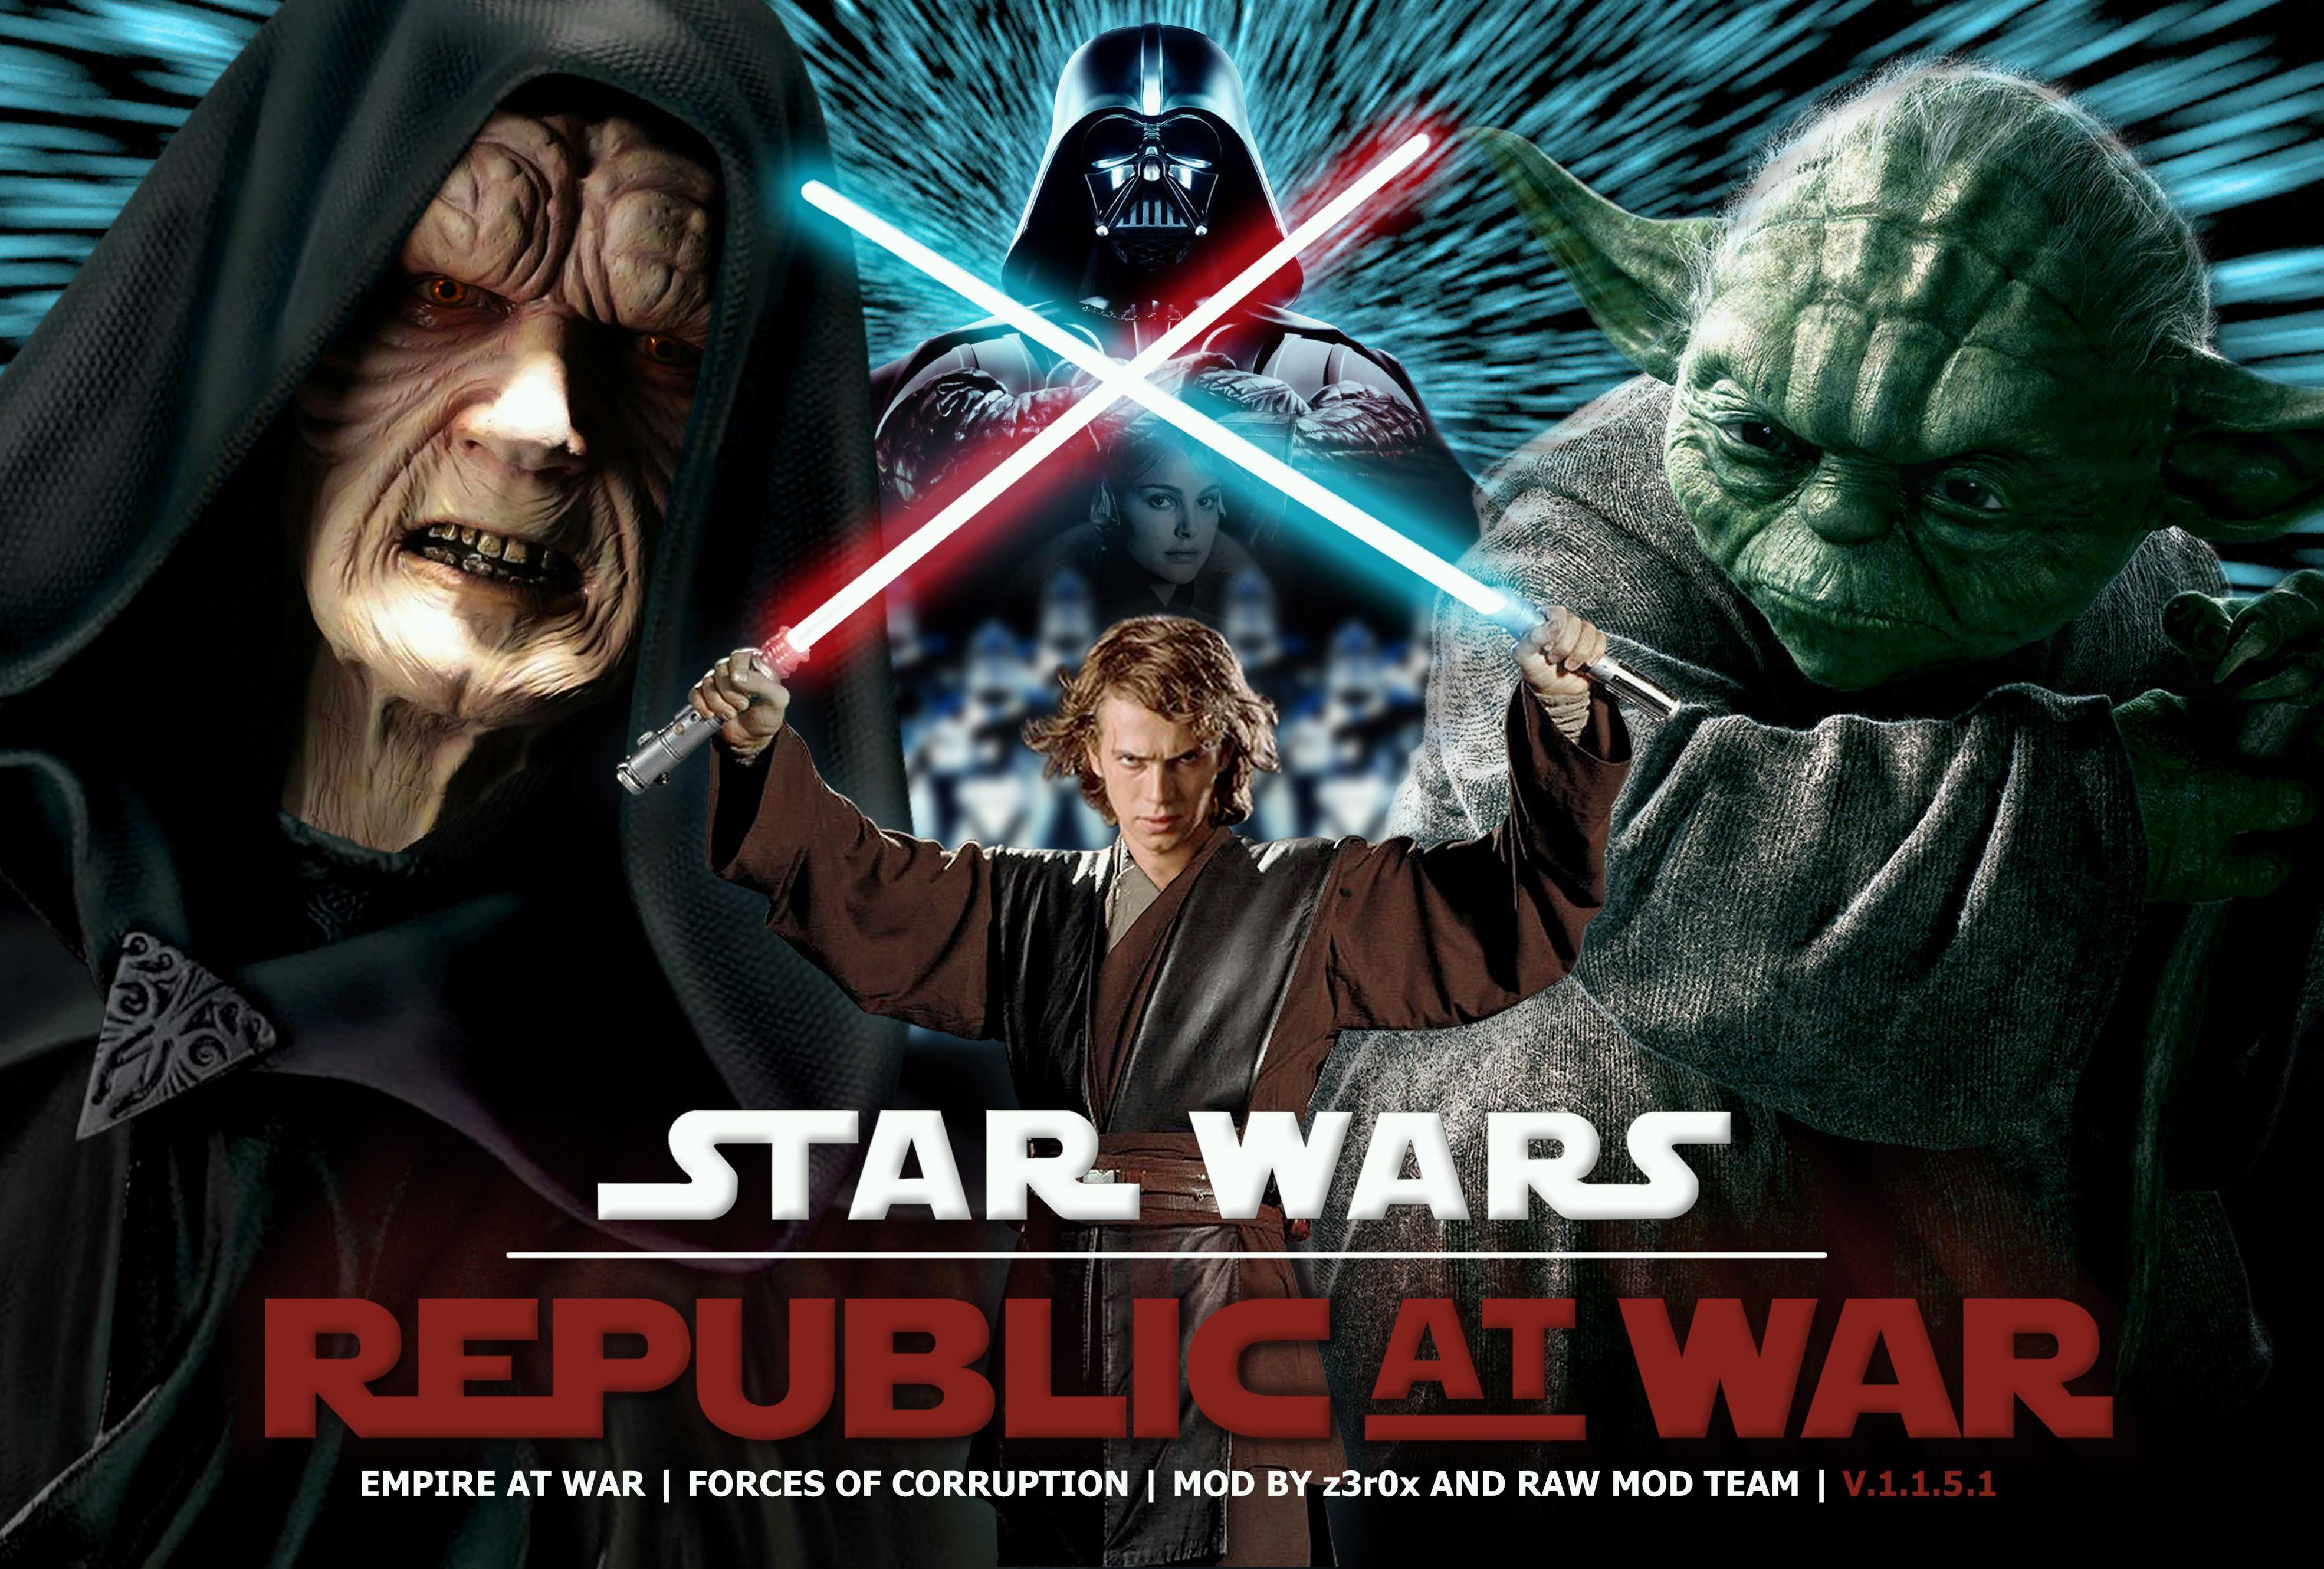 star wars empire at war forces of corruption no cd crack 1.5